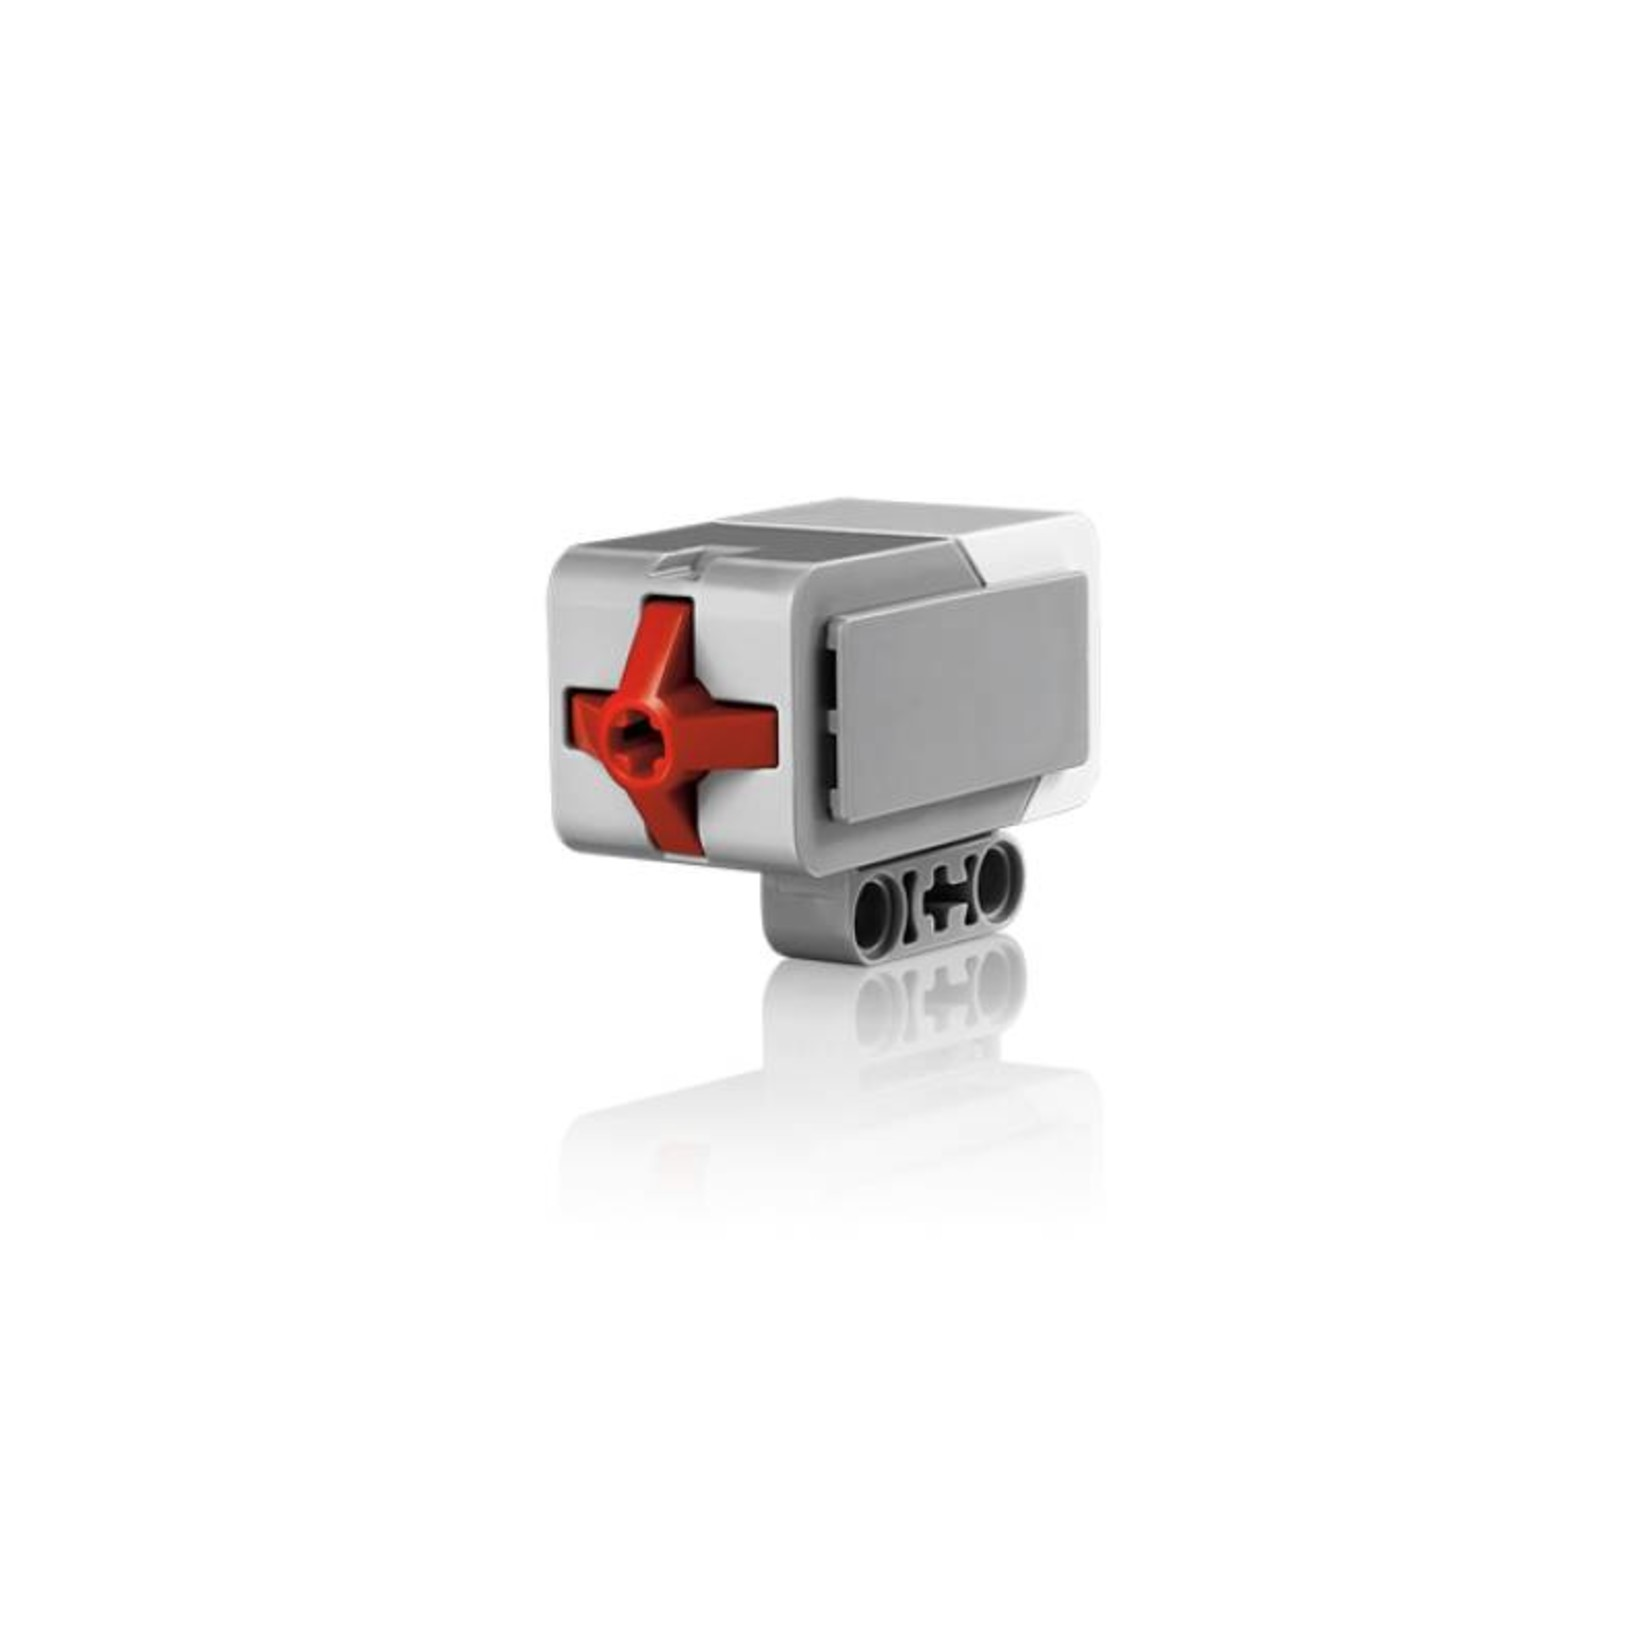 LEGO® Education EV3 Touch Sensor